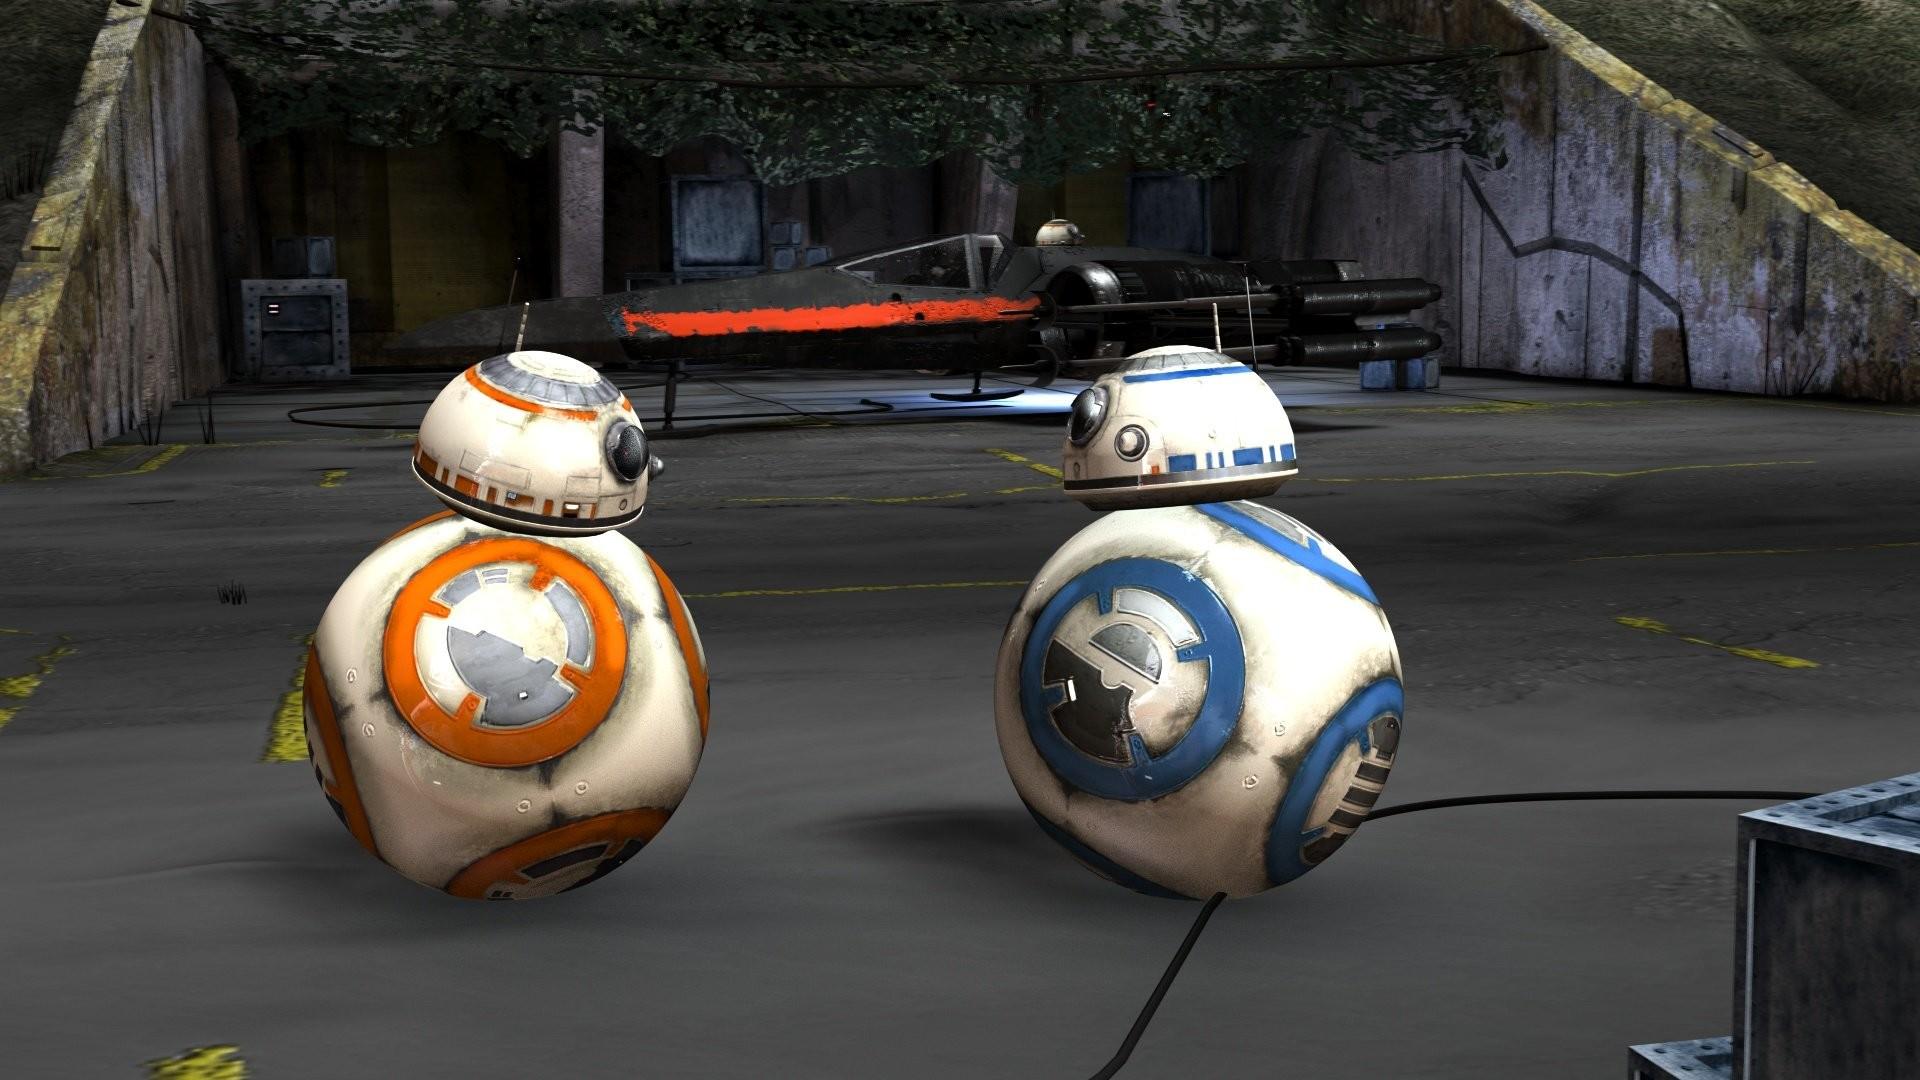 Bb-8 (Star Wars Vii The Force Awakens)